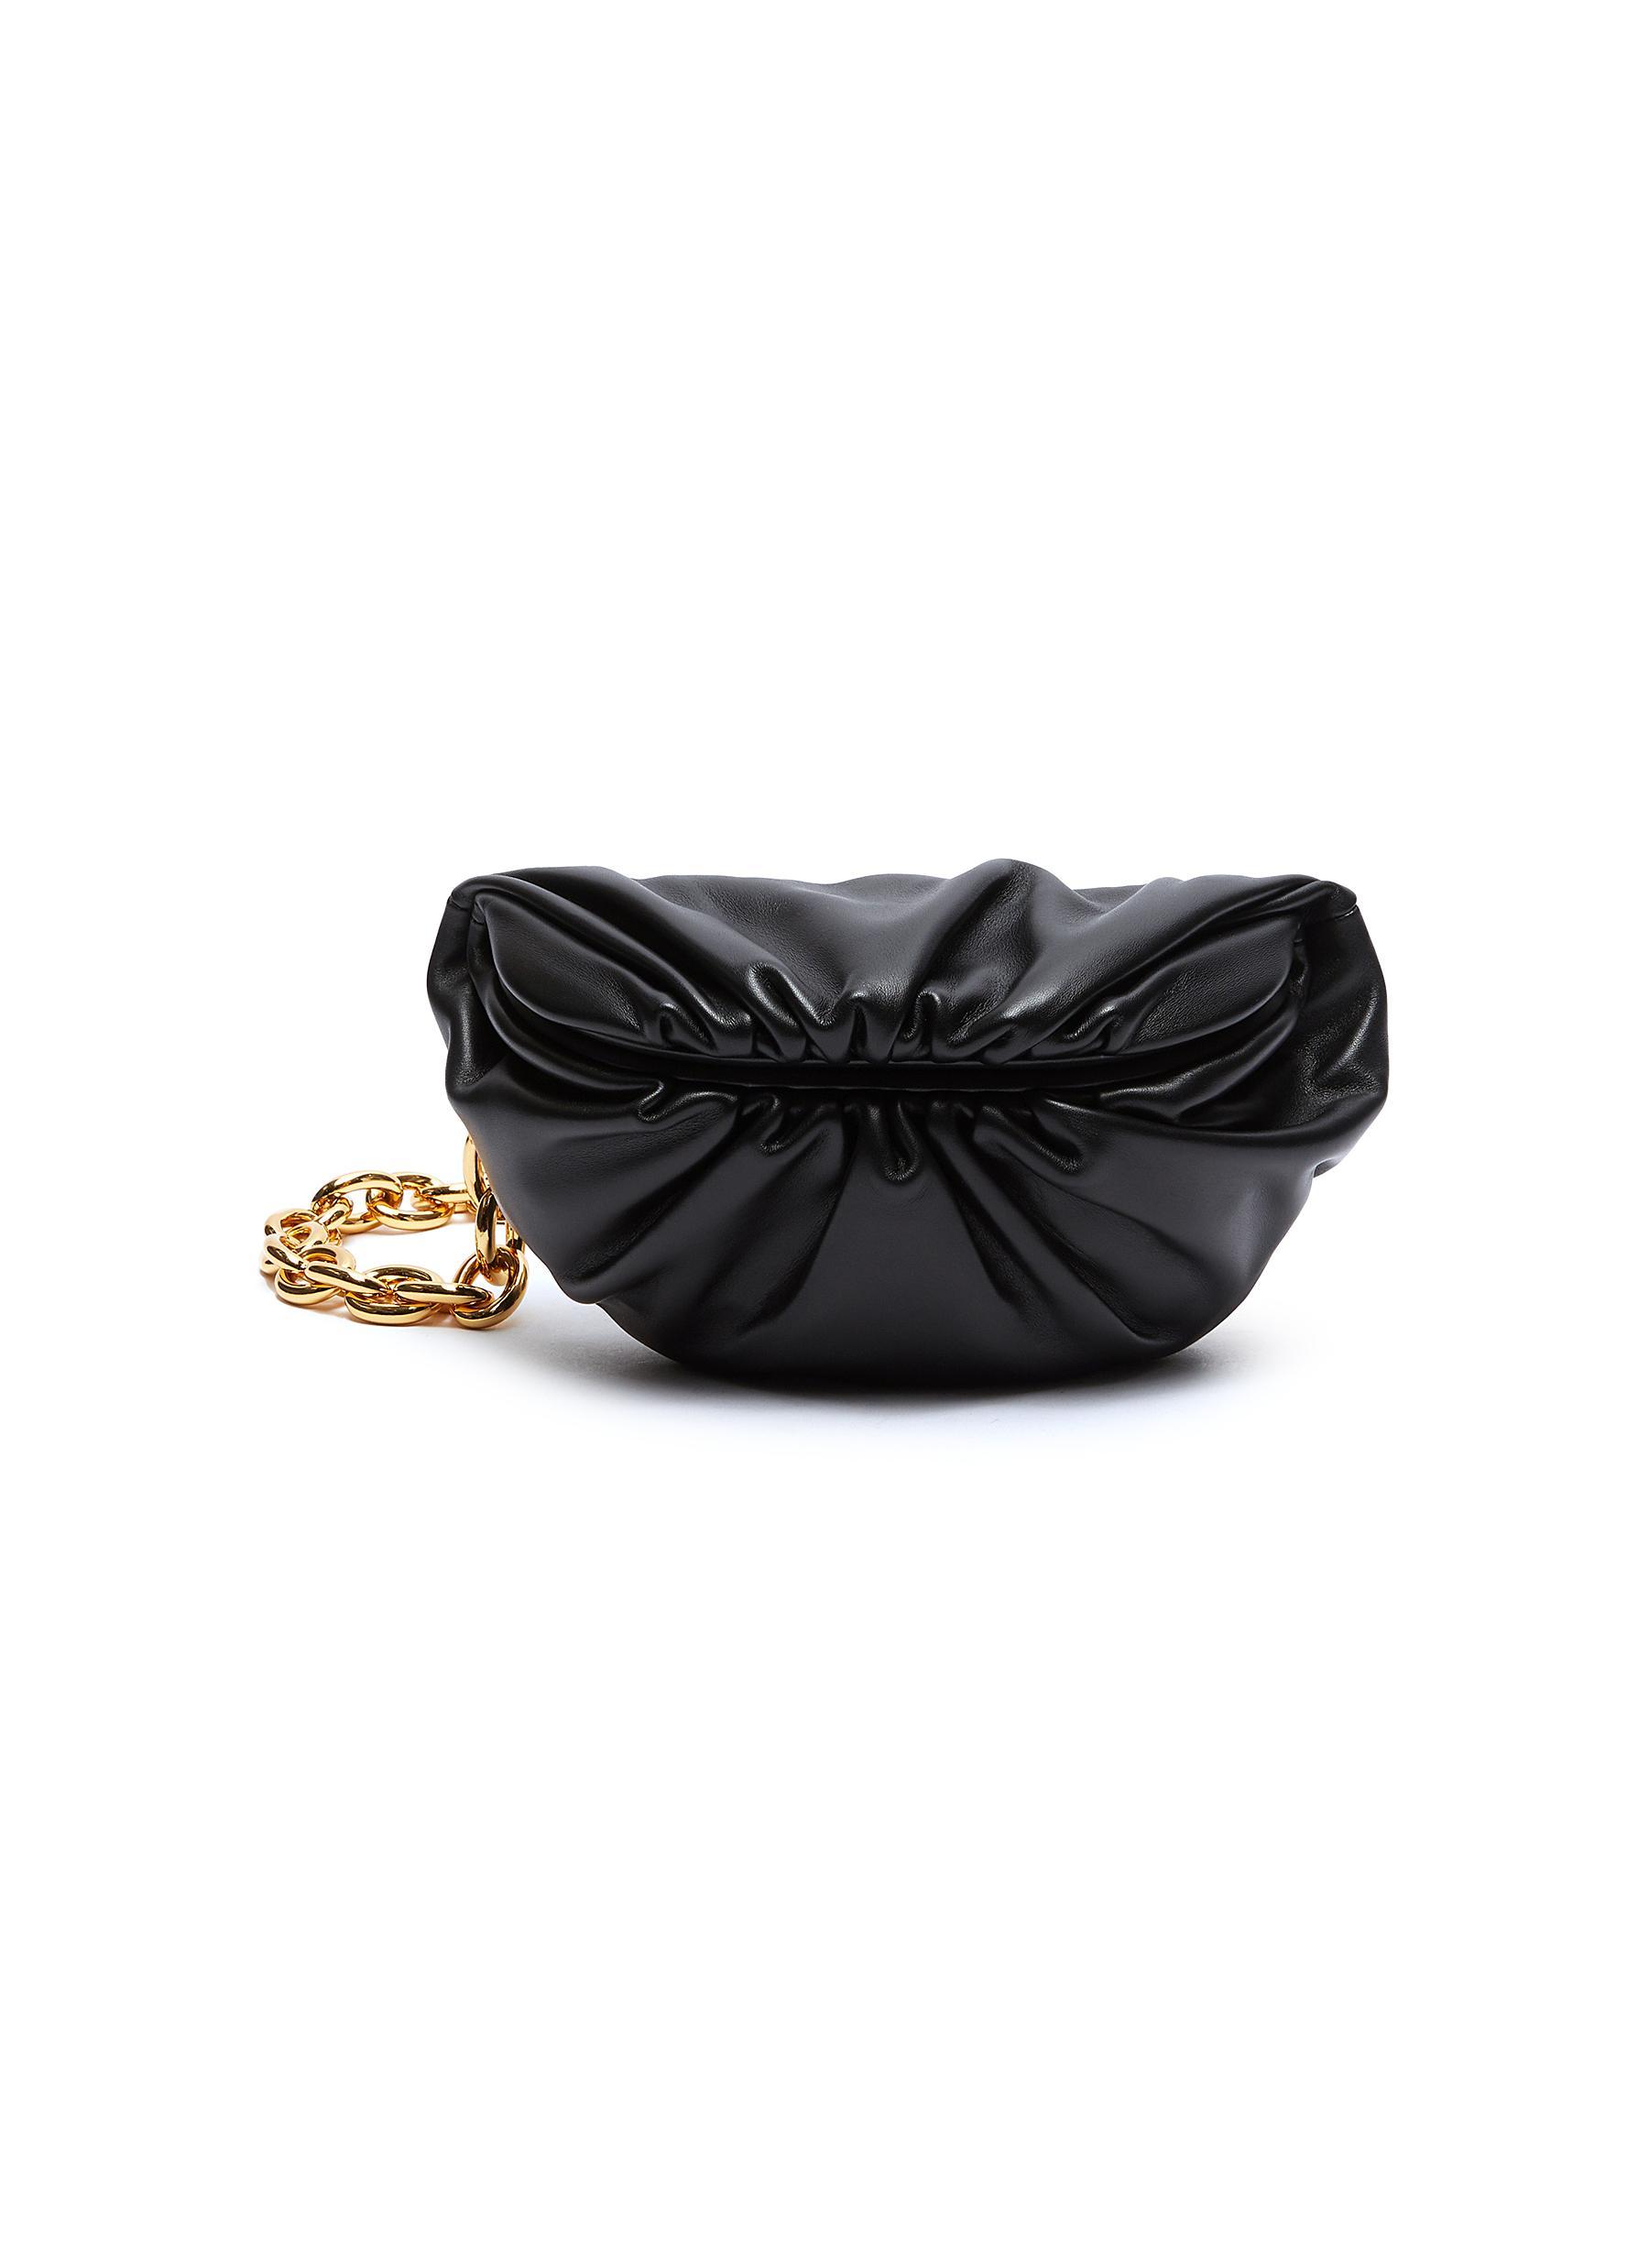 Bottega Veneta The Pouch' Chain Leather Shoulder Bag In Black